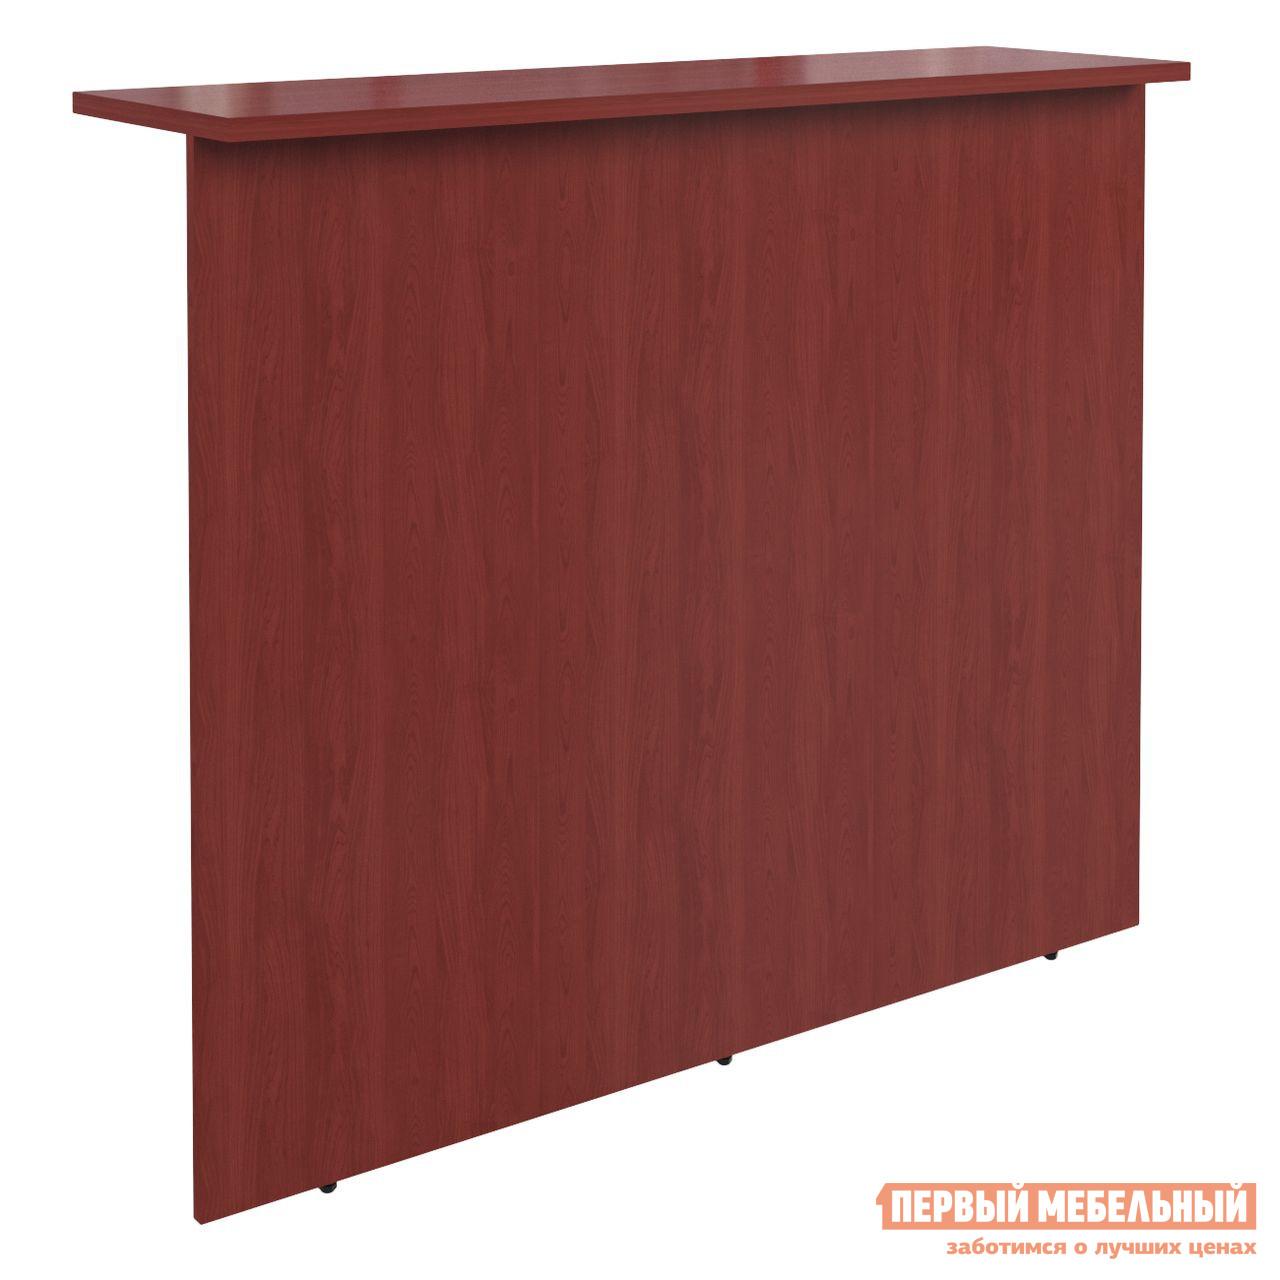 Стойка ресепшн Тайпит DMS 120 ресепшн hongsheng furniture